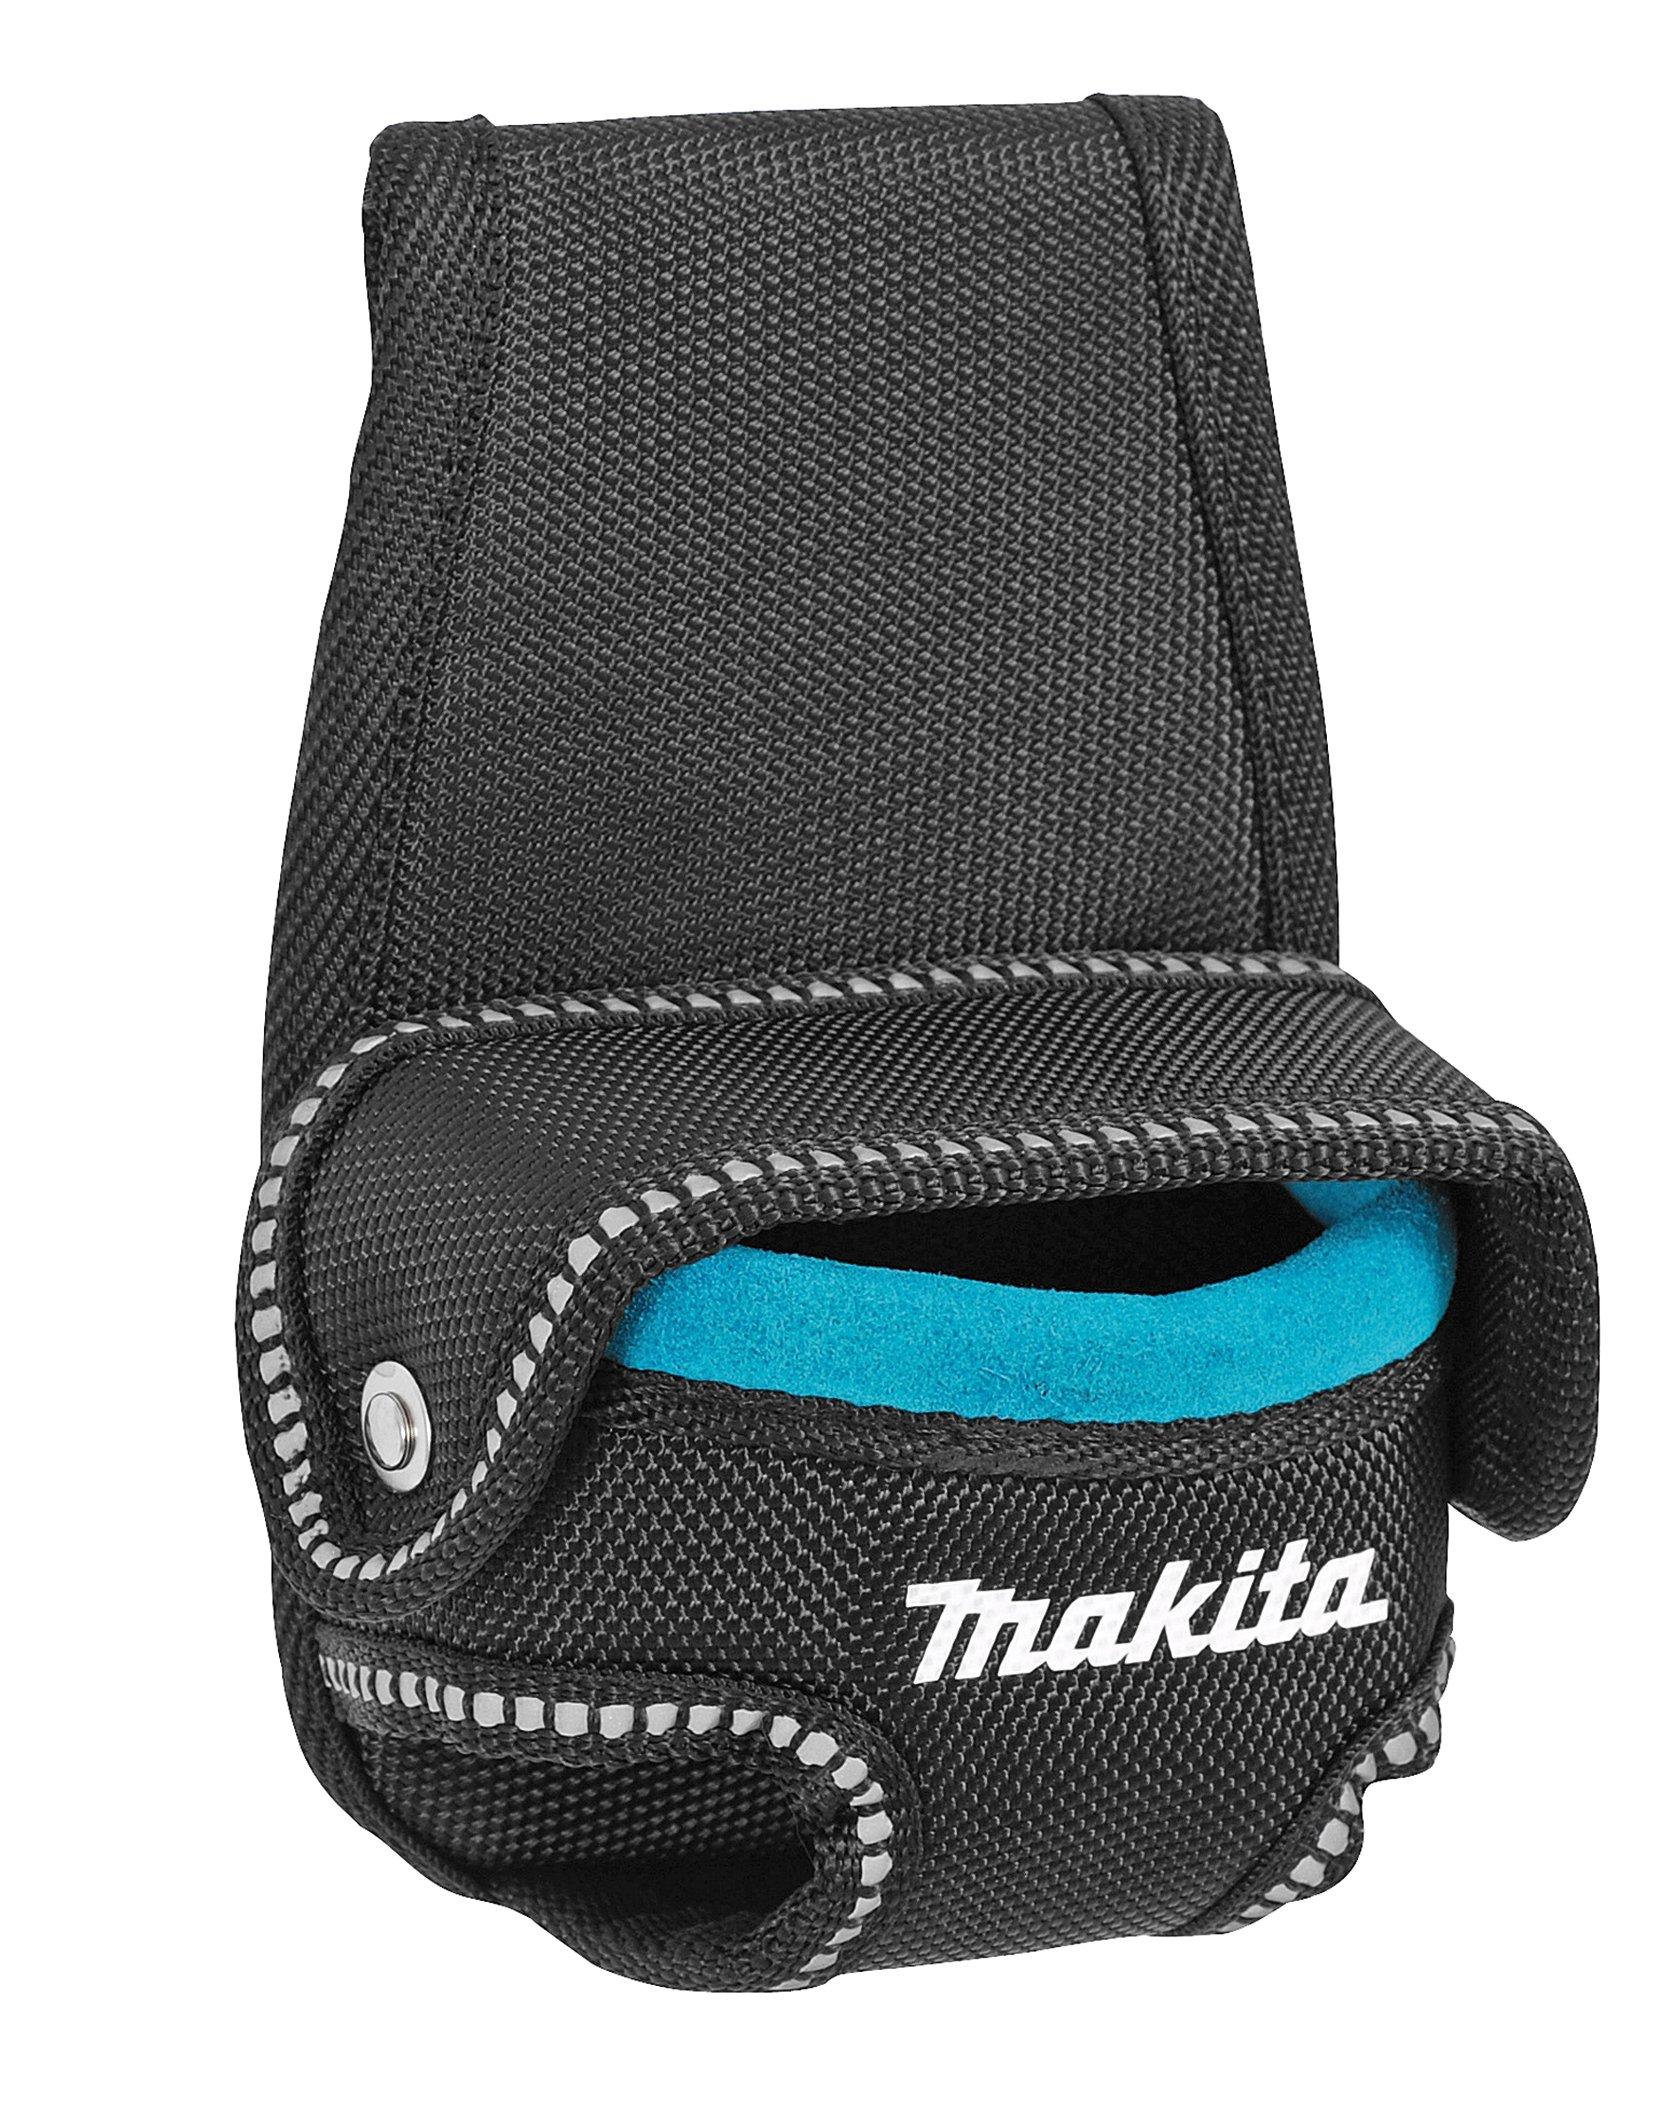 Makita P-71831 Tape Holder, Black